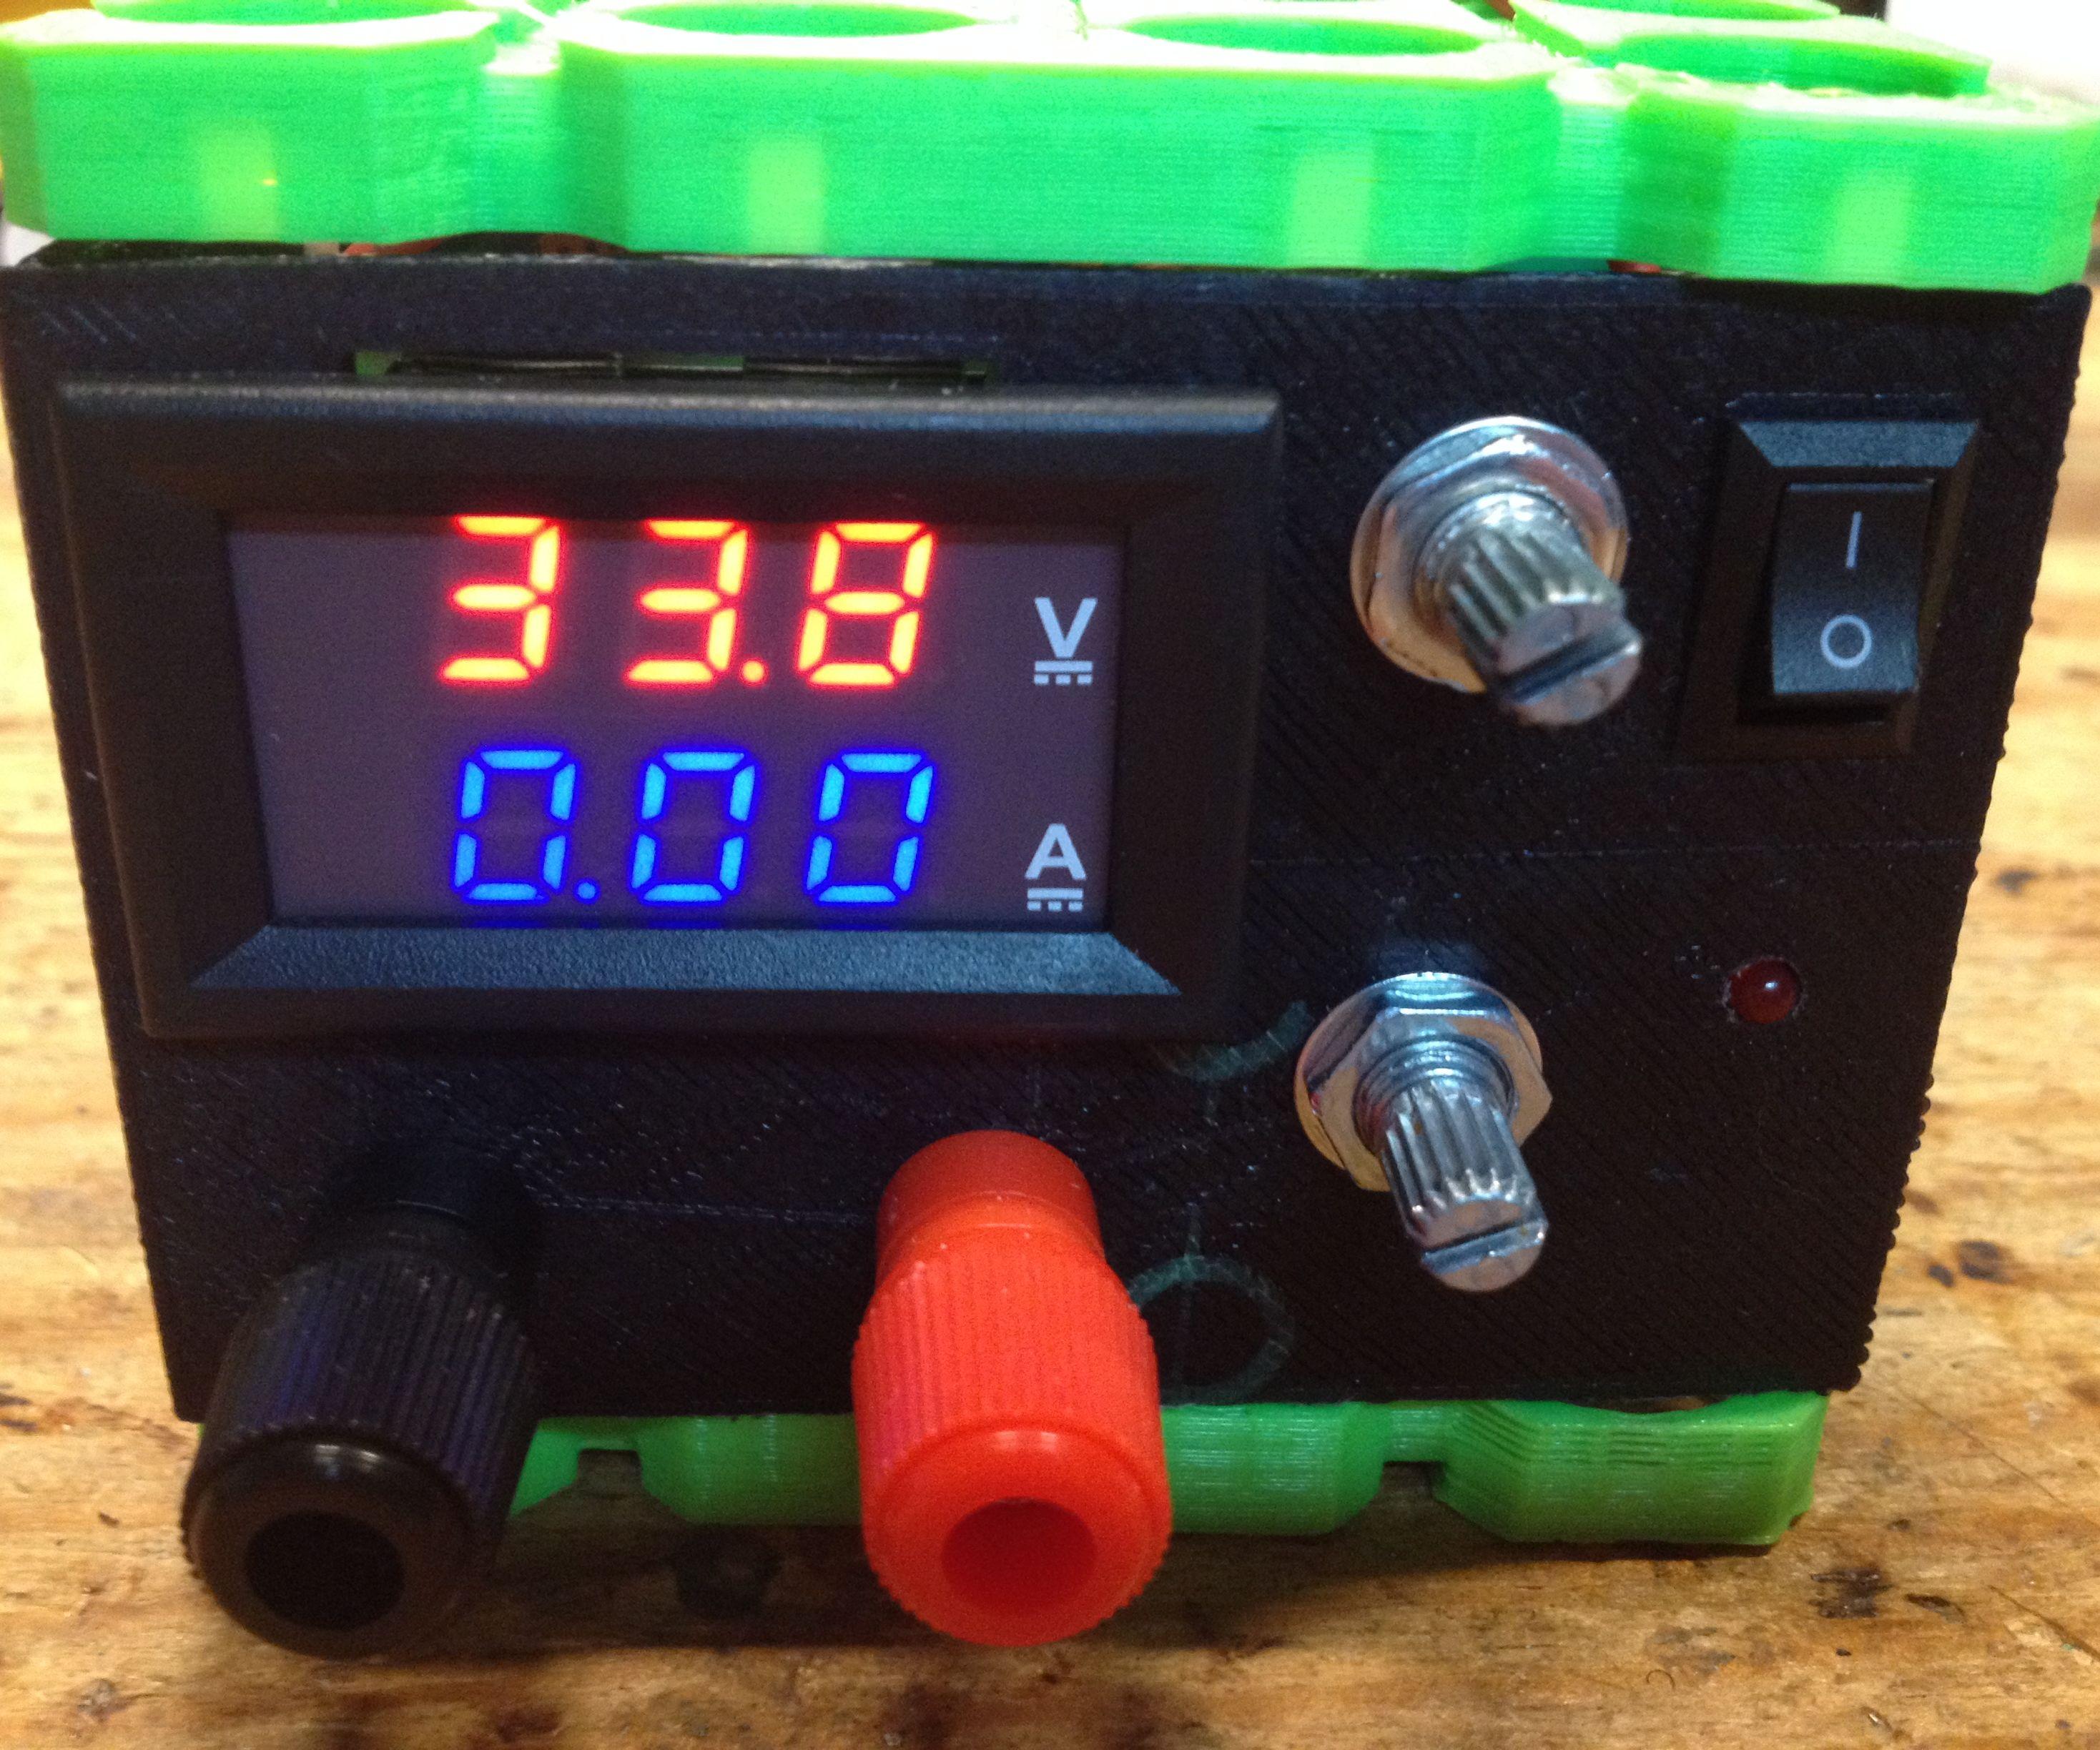 DIY CC CV Variable Bench Power Supply 1-32V, 0-5A